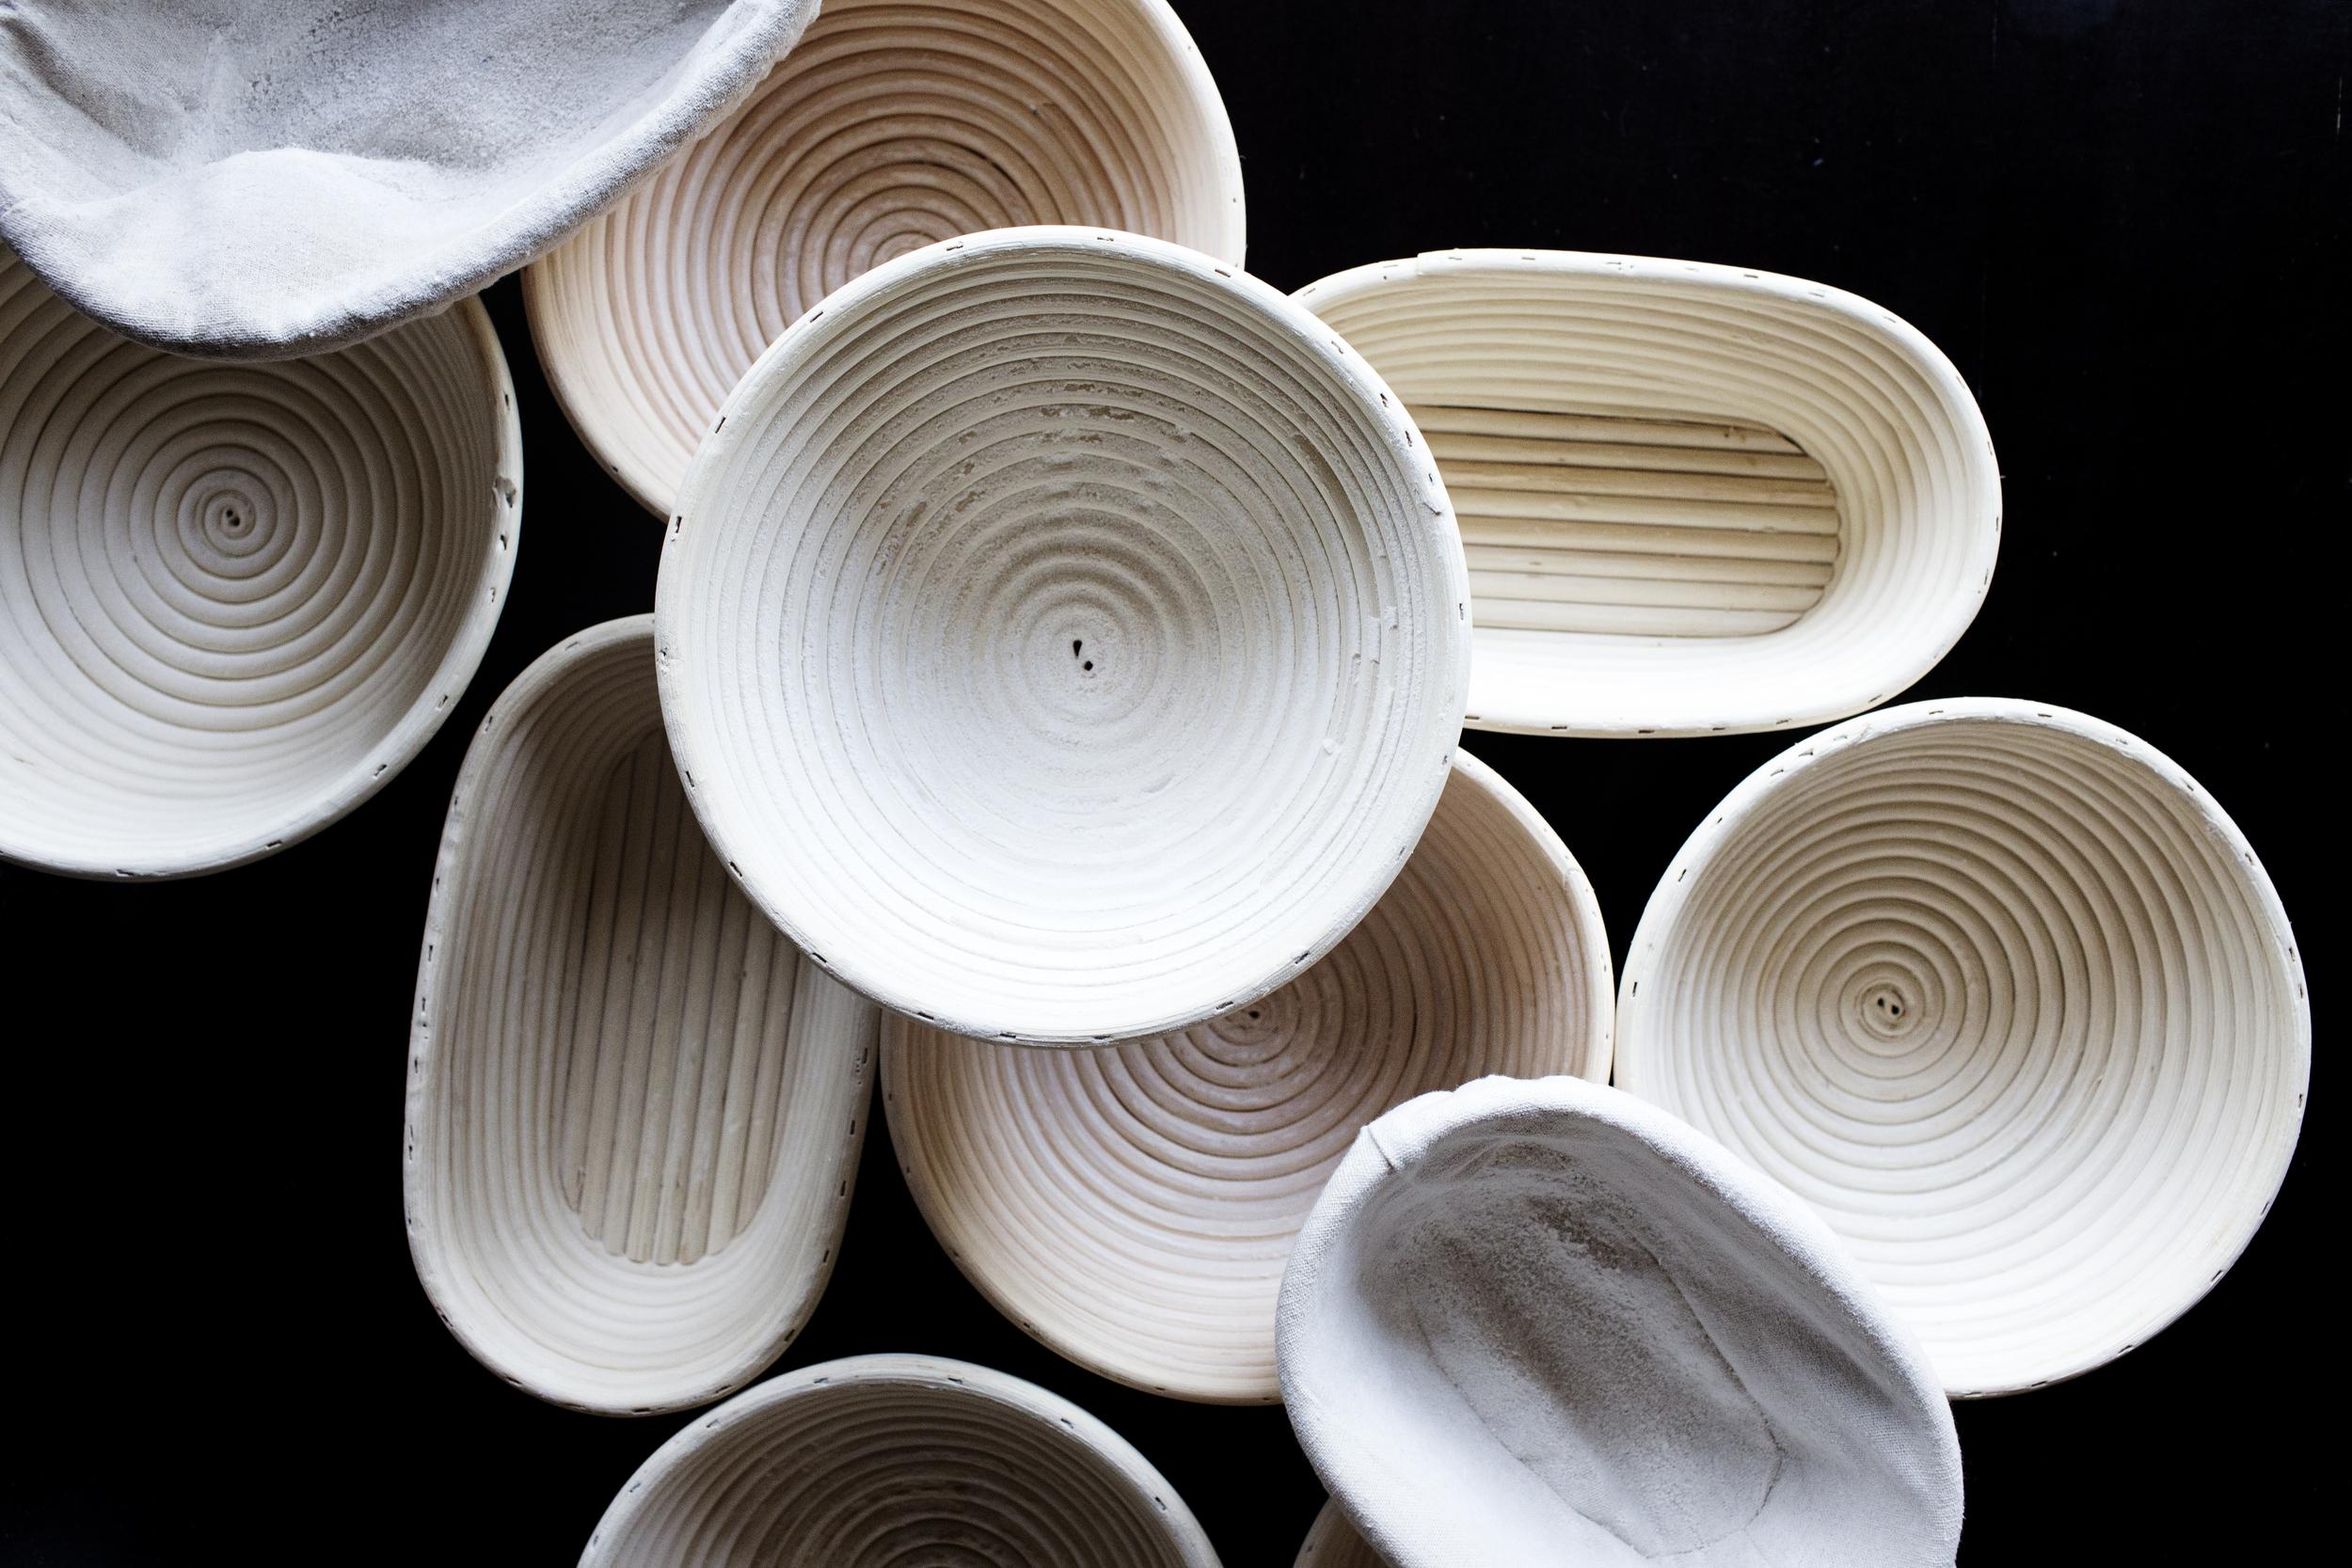 Creative Direction & Styling: Liz Gardner for Bodega Ltd. Photo:  Eliesa Johnson